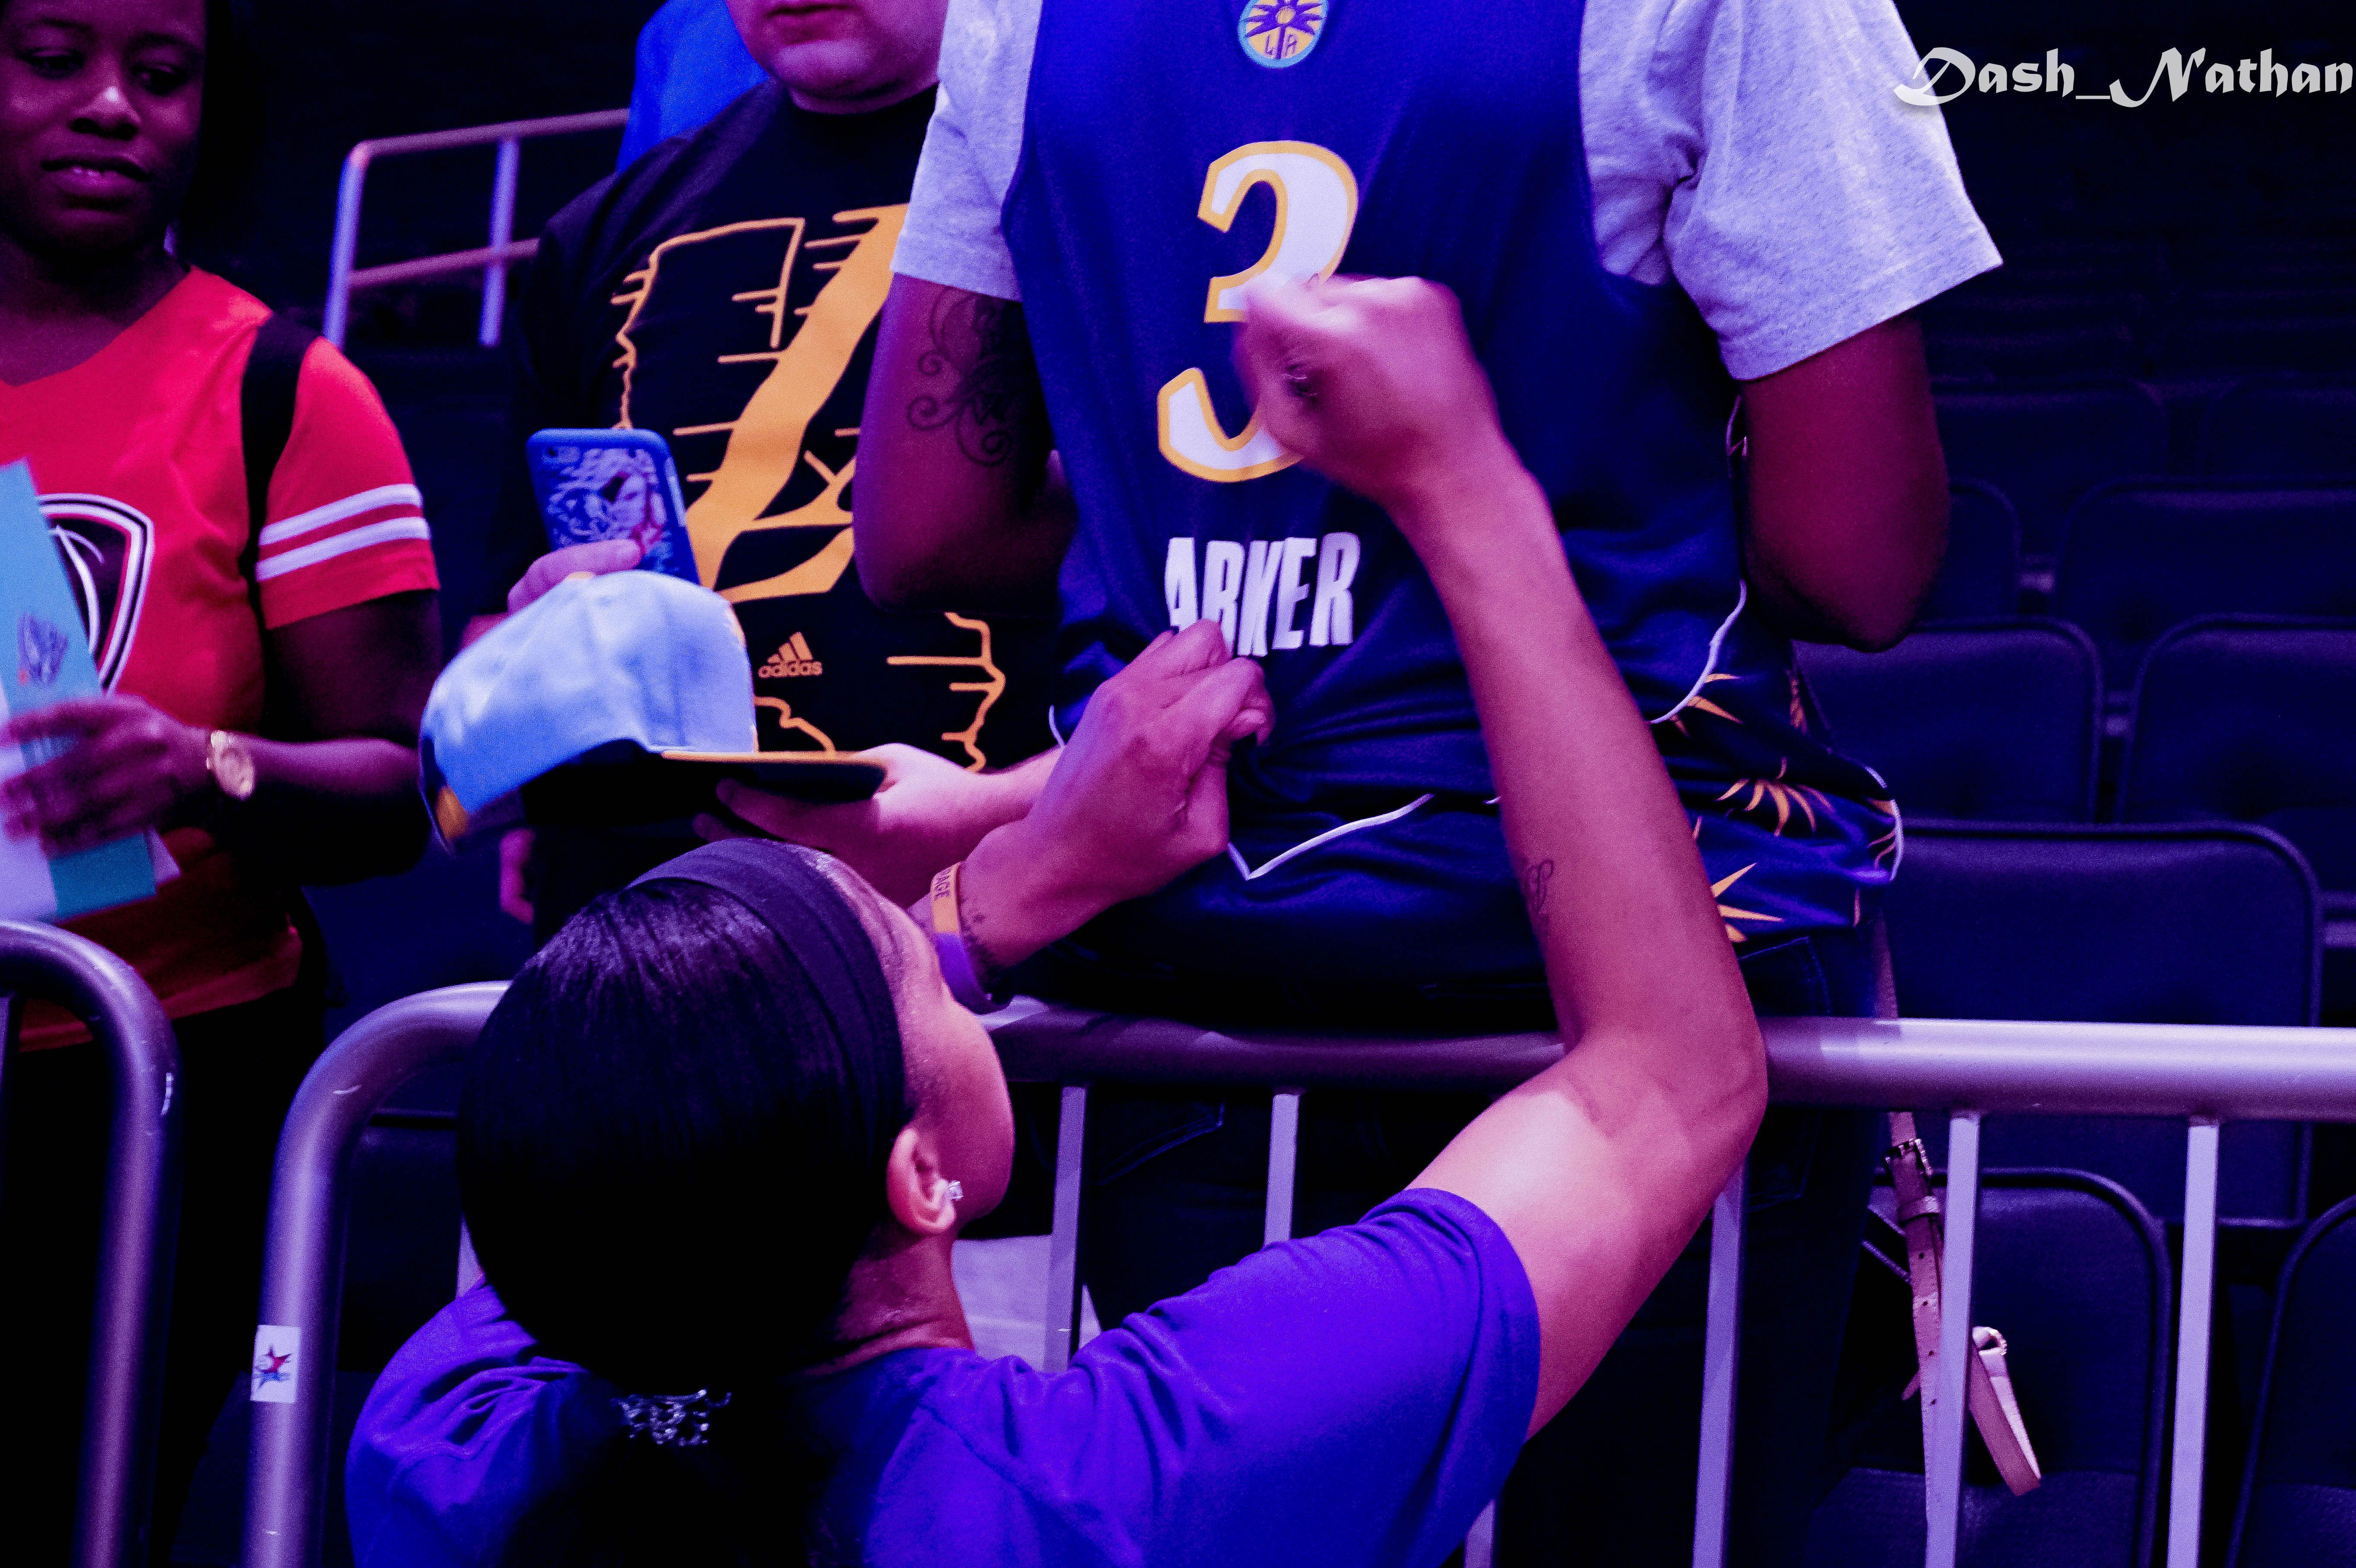 Pin by Sherman Gomez on NBA Nba, Concert, Basketball